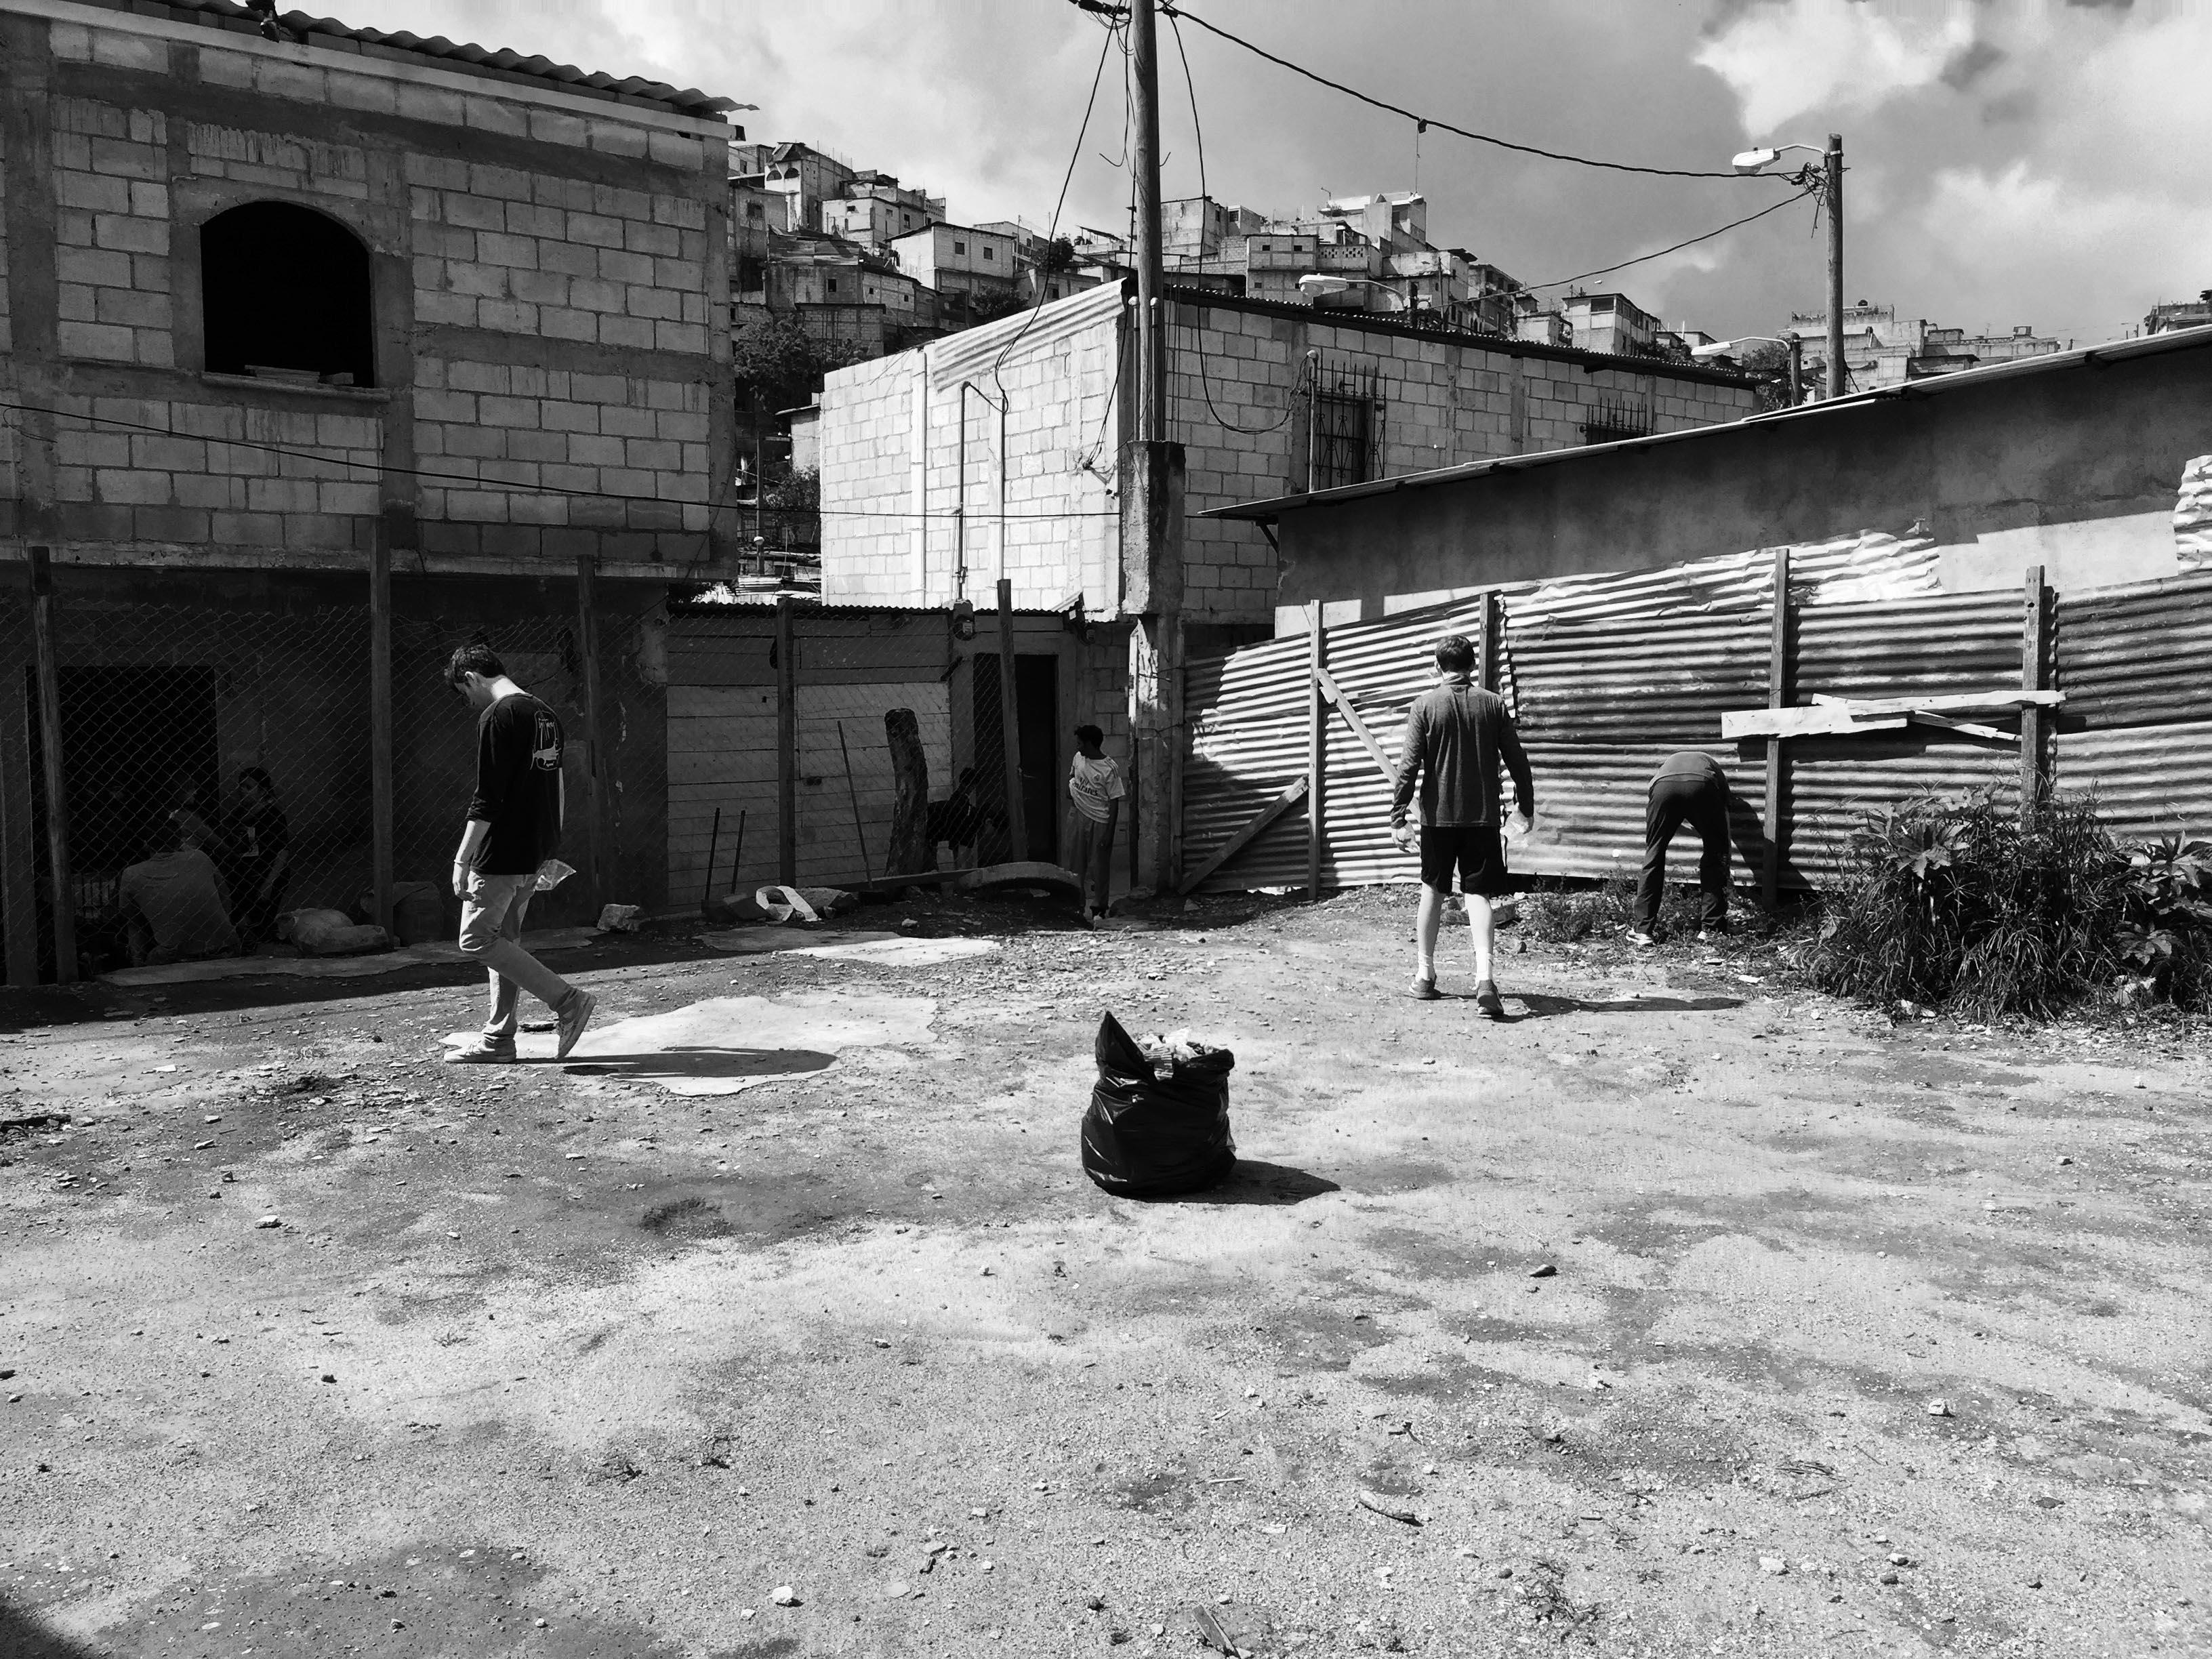 Proctor Academy Summer Service Guatemala-8.jpg